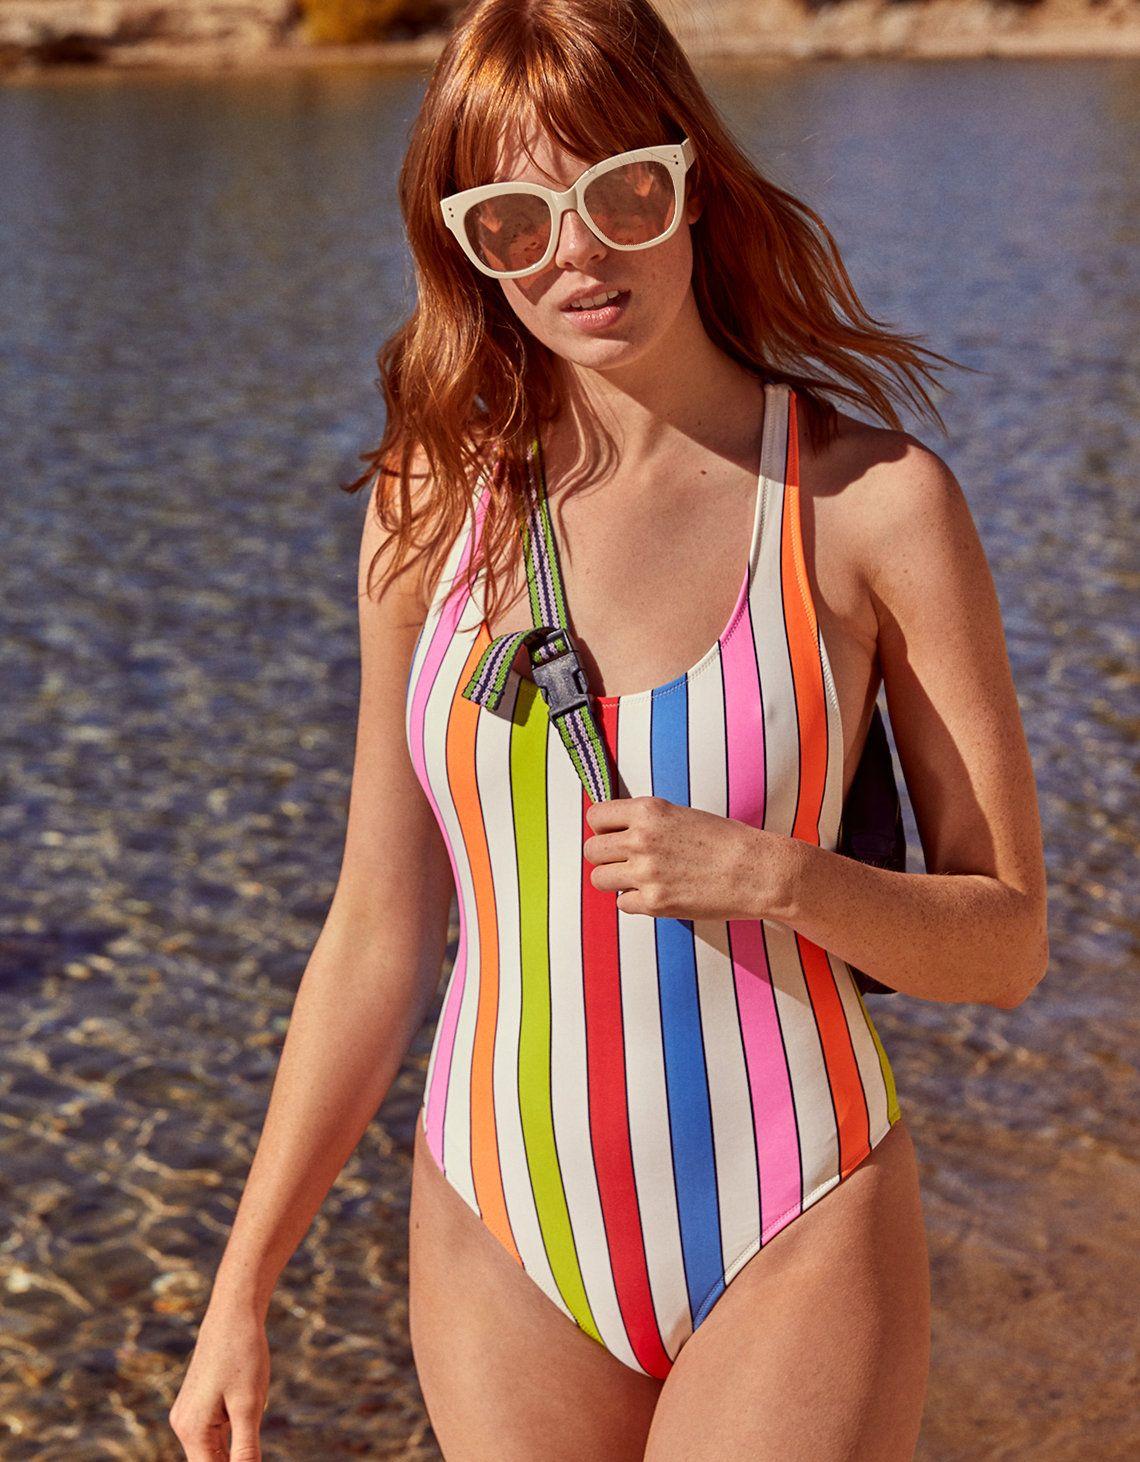 ca92c56c91525 Aerie The One Piece Racerback Swimsuit Assorted Color